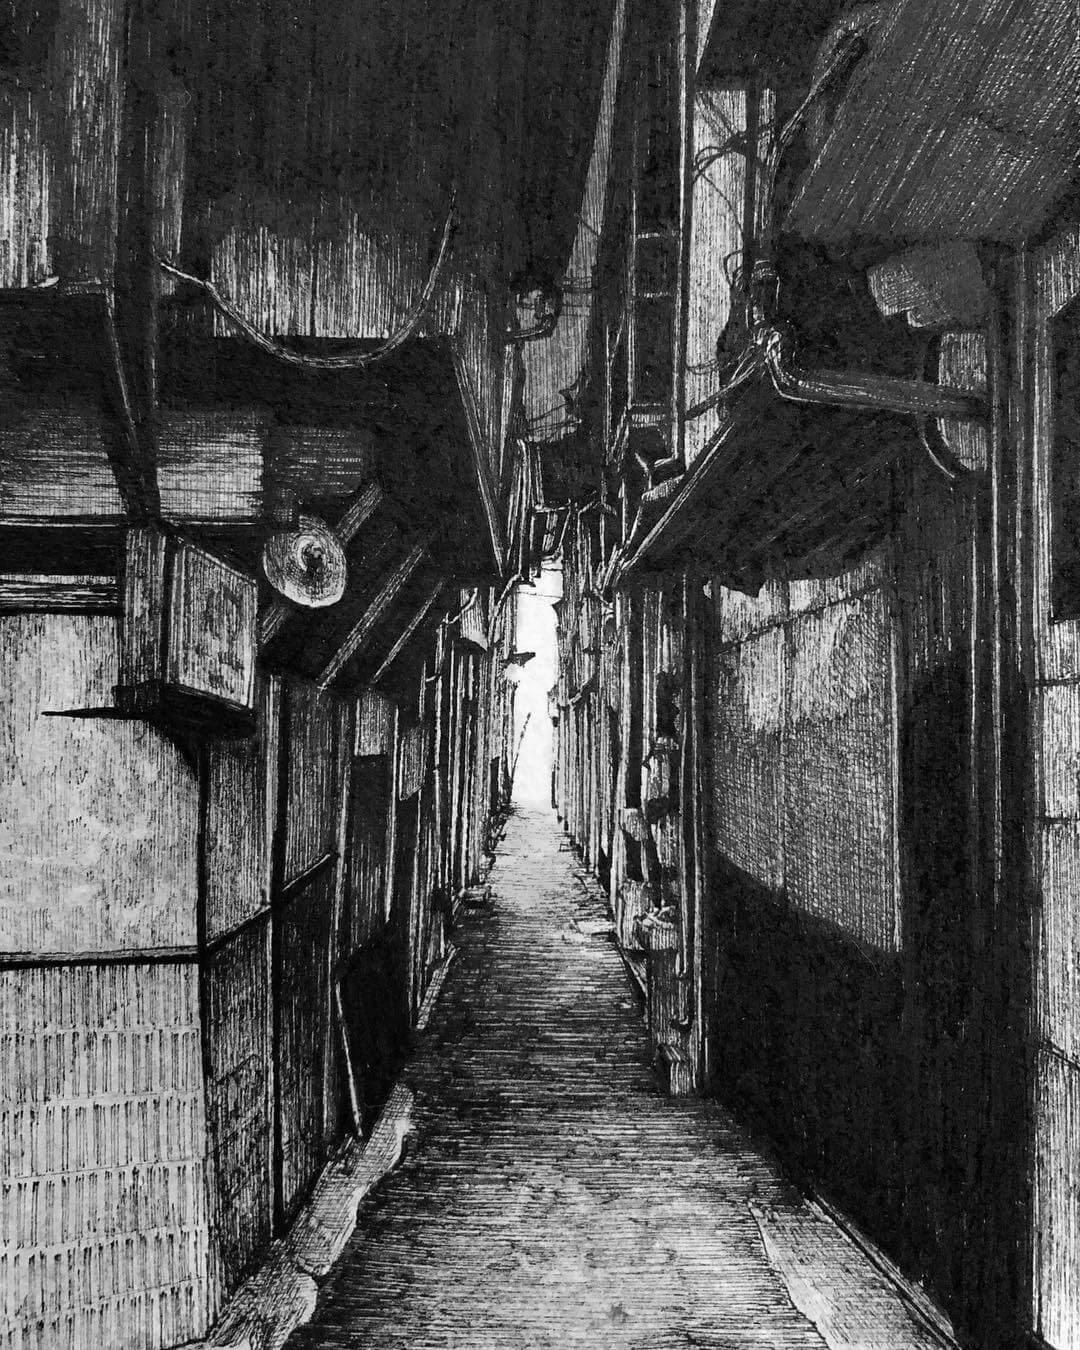 07-Dark-Alley-ibsuki-Urban-Architectural-Pen-Drawings-www-designstack-co